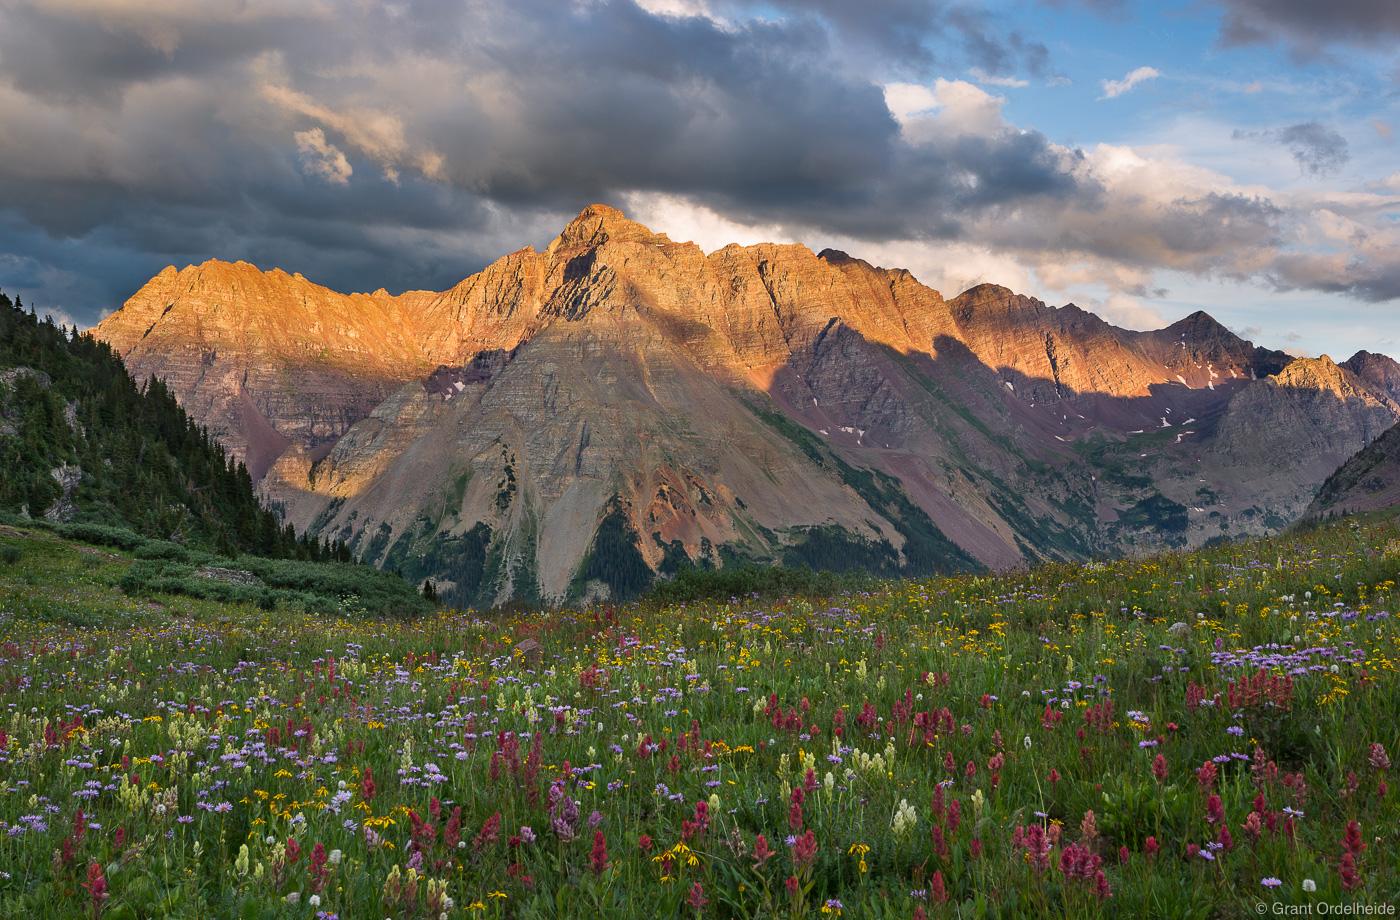 pyramid peak, maroon bells, wilderness, aspen, colorado, wildflower, buckskin pass,, photo